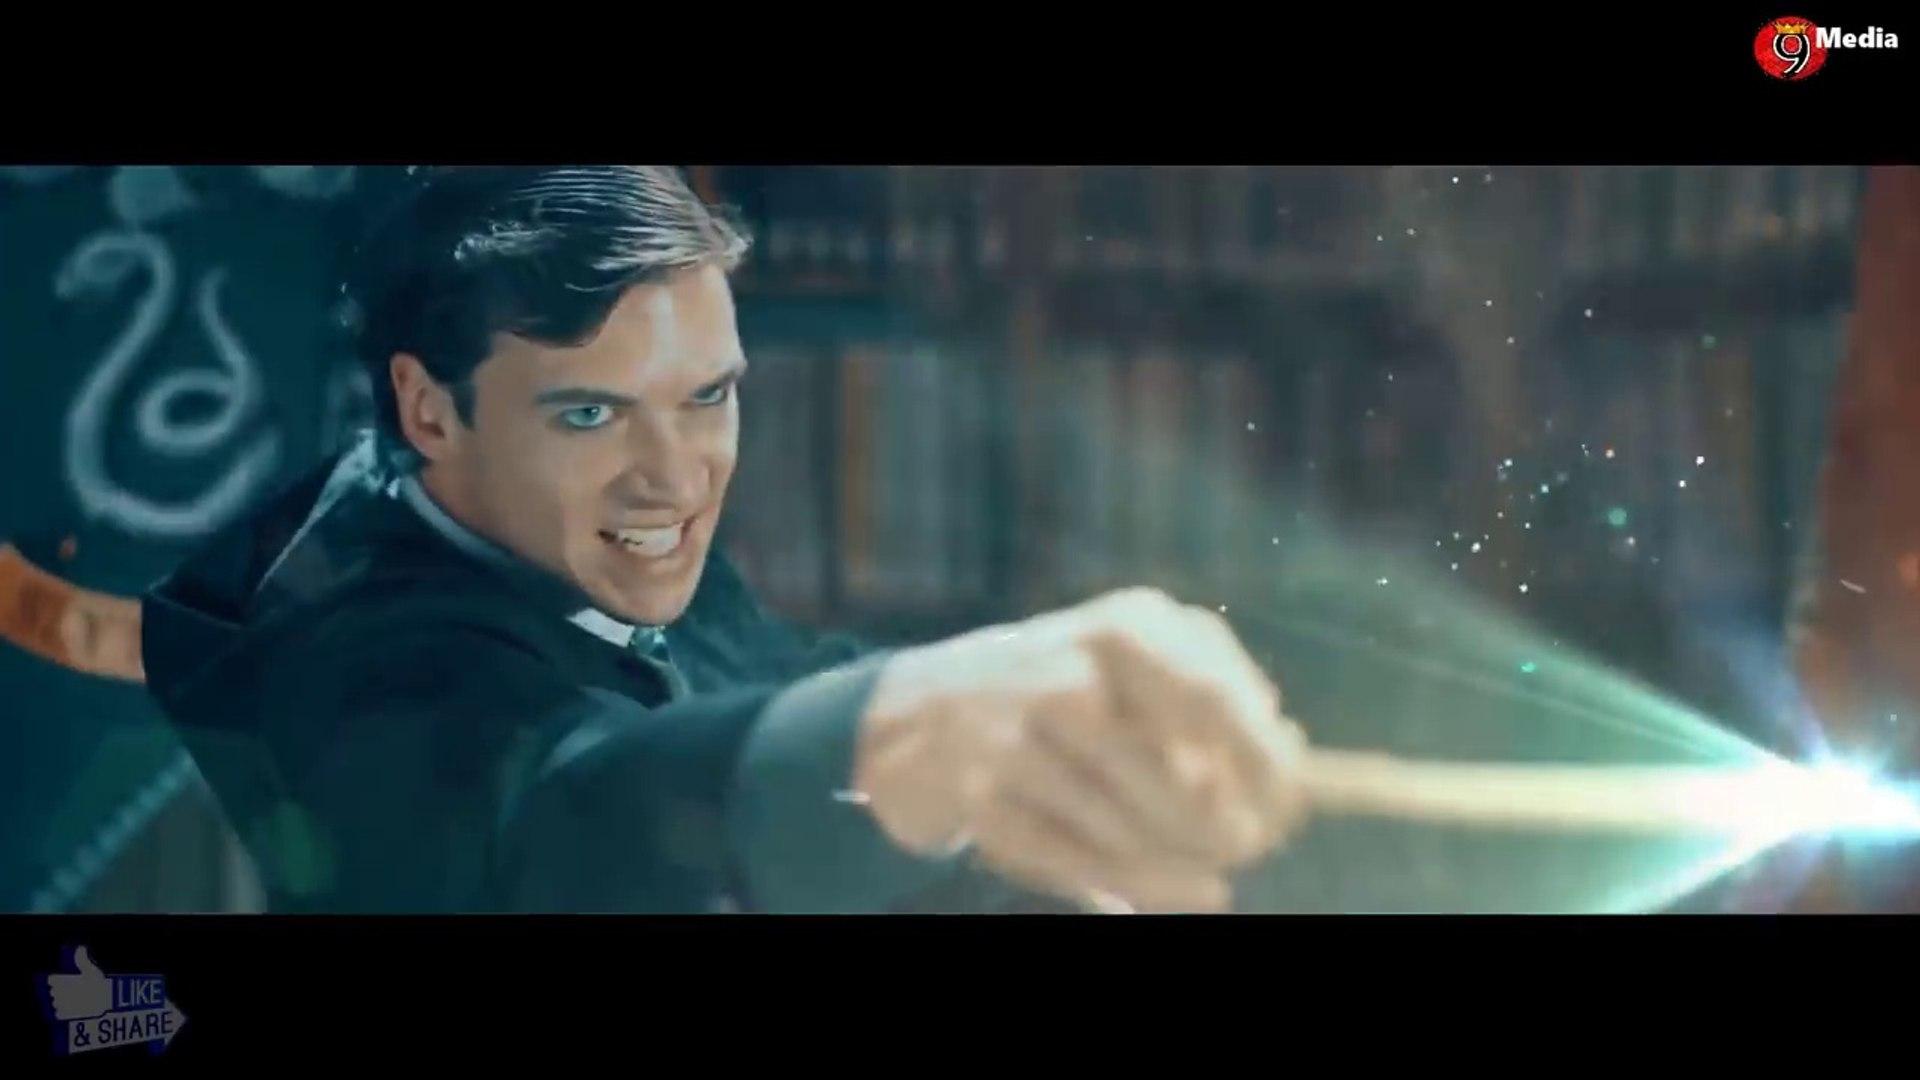 Trailer - VOLDEMORT Final Trailer (2018) Origins Of The Heir, Harry Potter New Movie HD